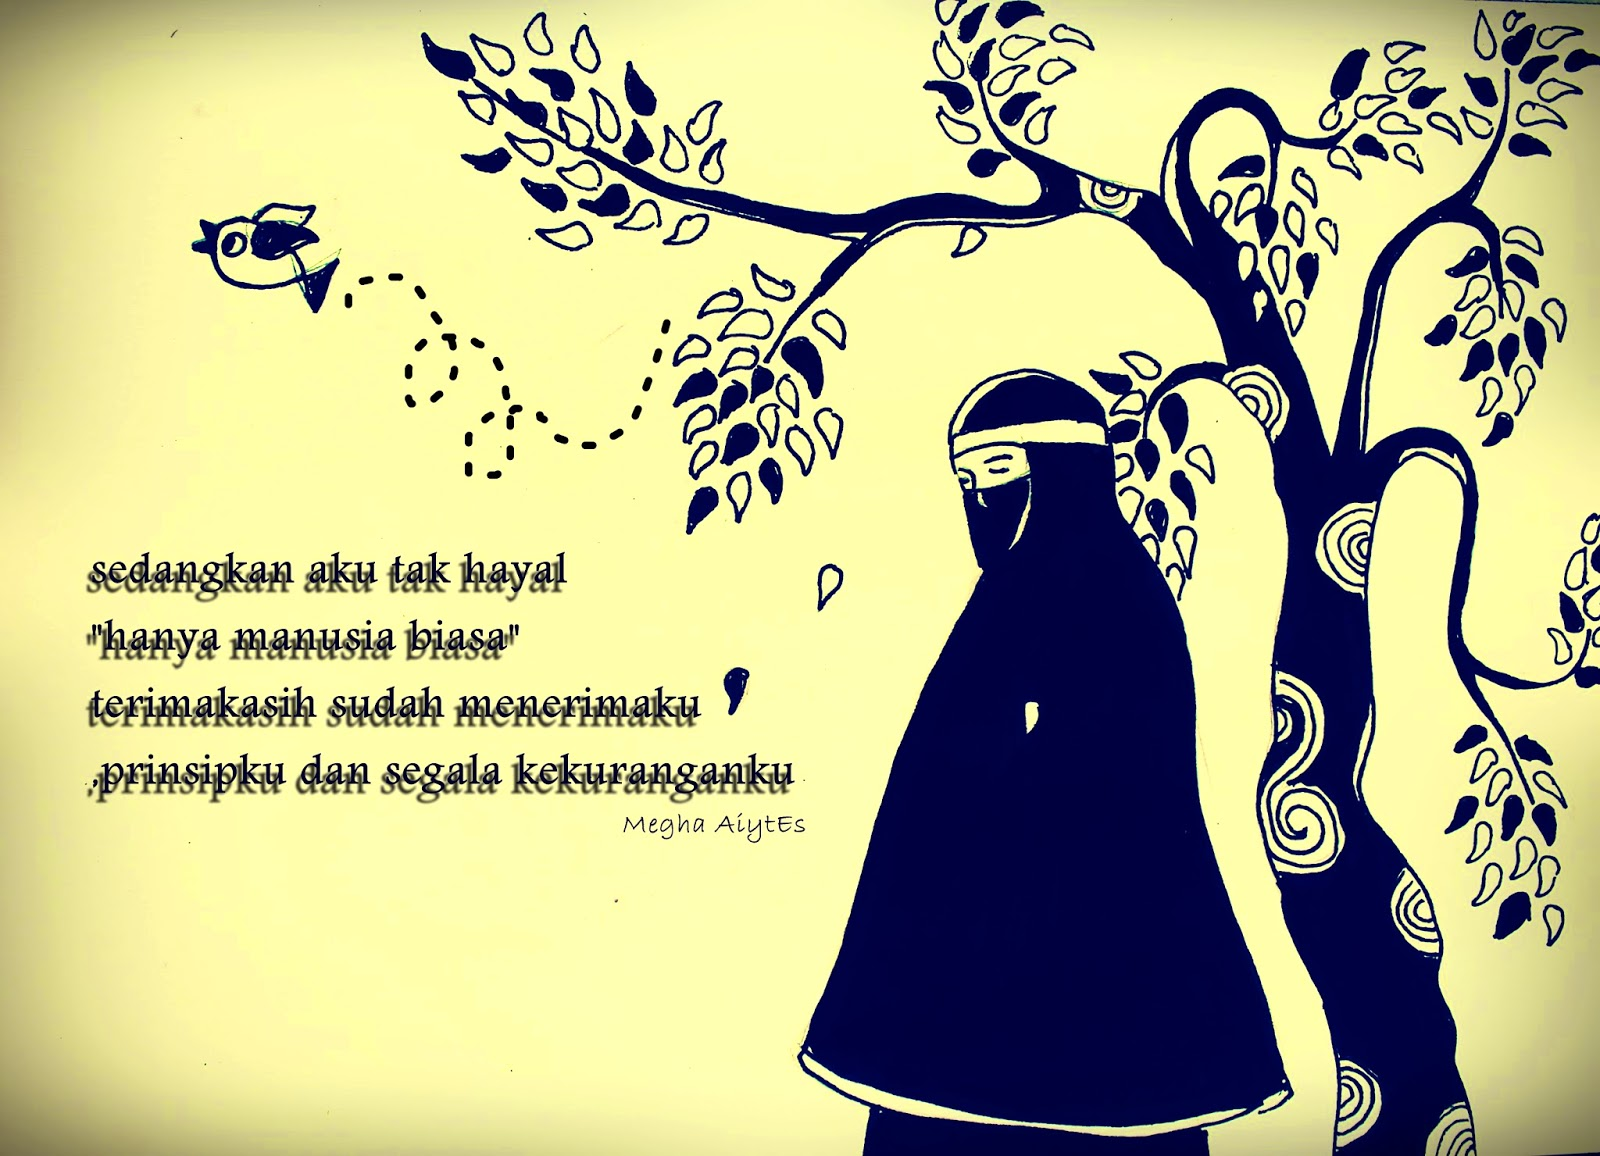 Gambar Kartun Muslimah Cantik Berkacamata: Gambar Kartun Muslimah Untuk Sampul Facebook